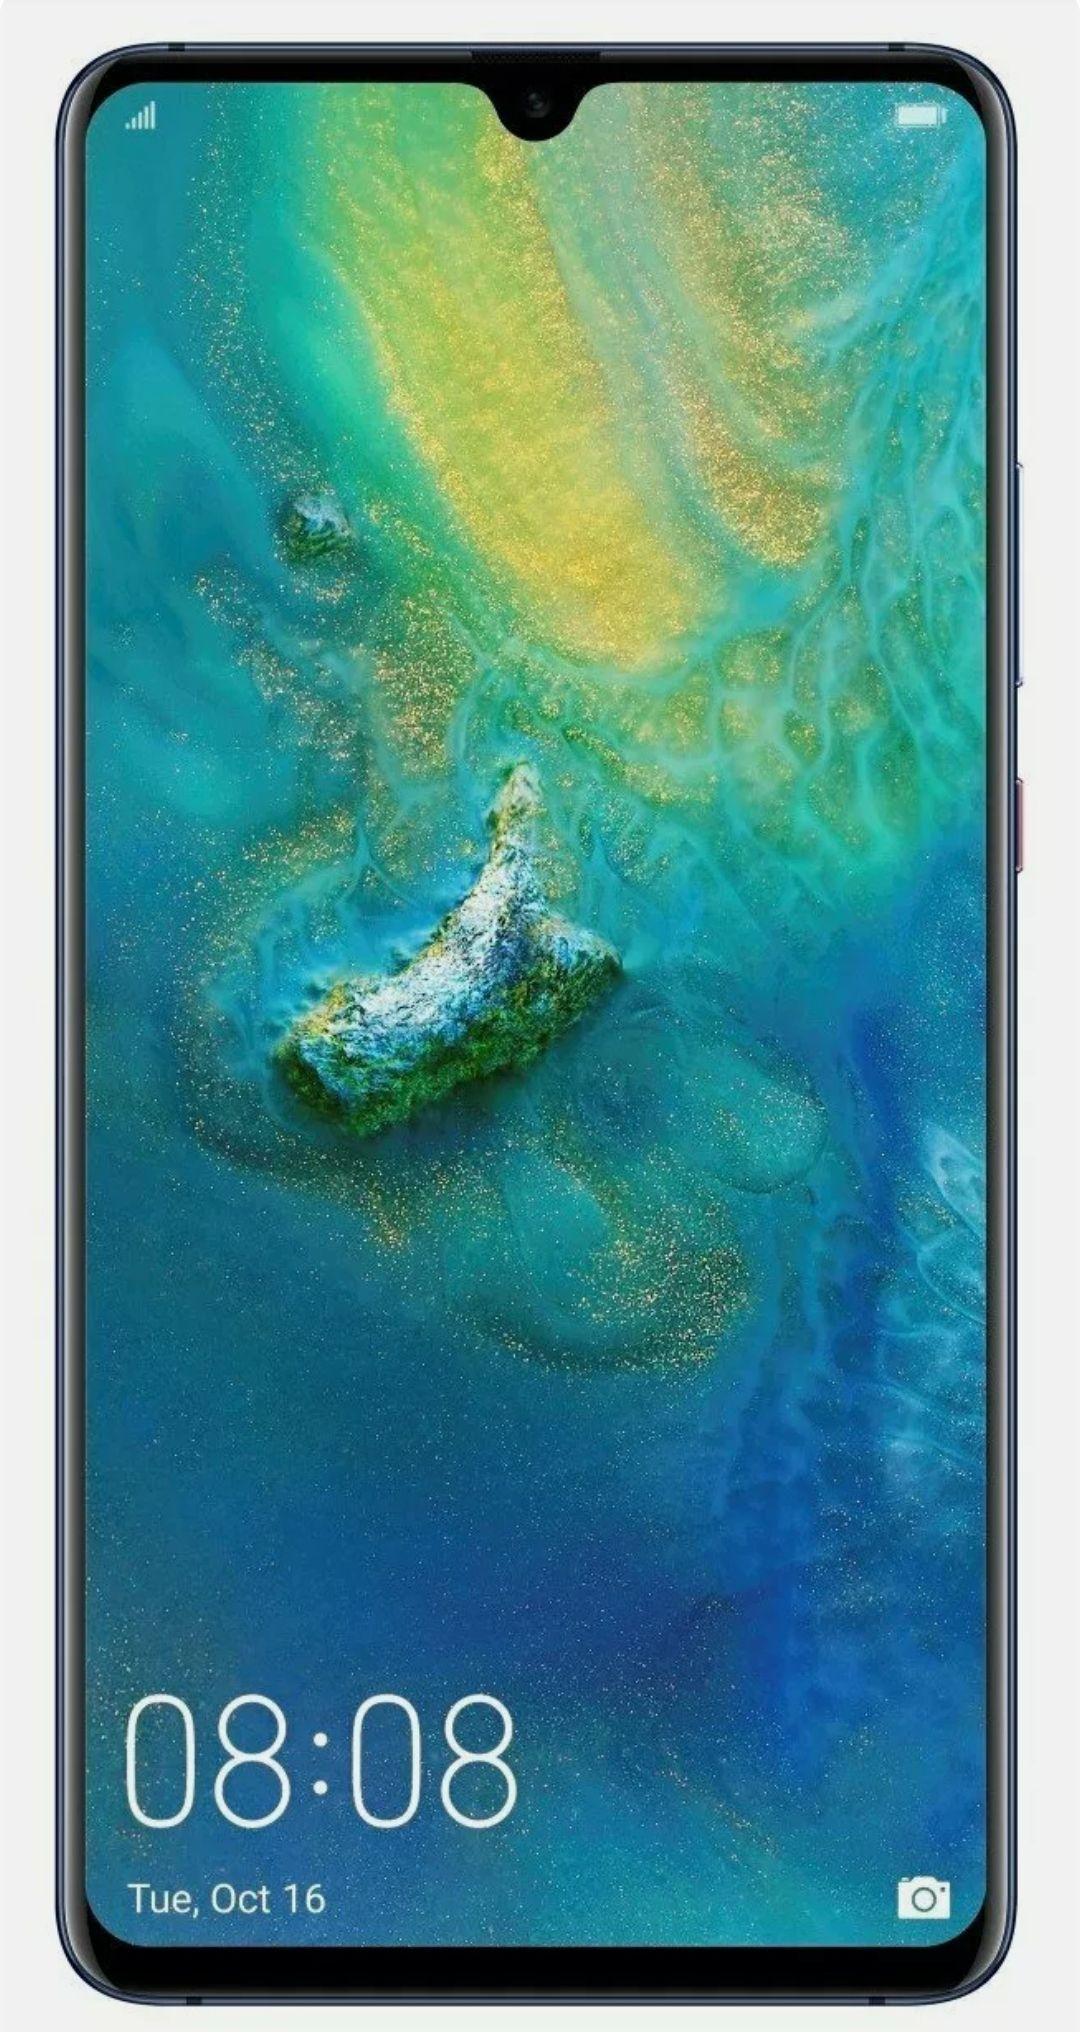 Refurbished SIM Free Huawei Mate 20 X 7.2 Inch 128GB 40MP Dual Sim Mobile Phone - Blue Smartphone - £314.99 @ Argos Ebay